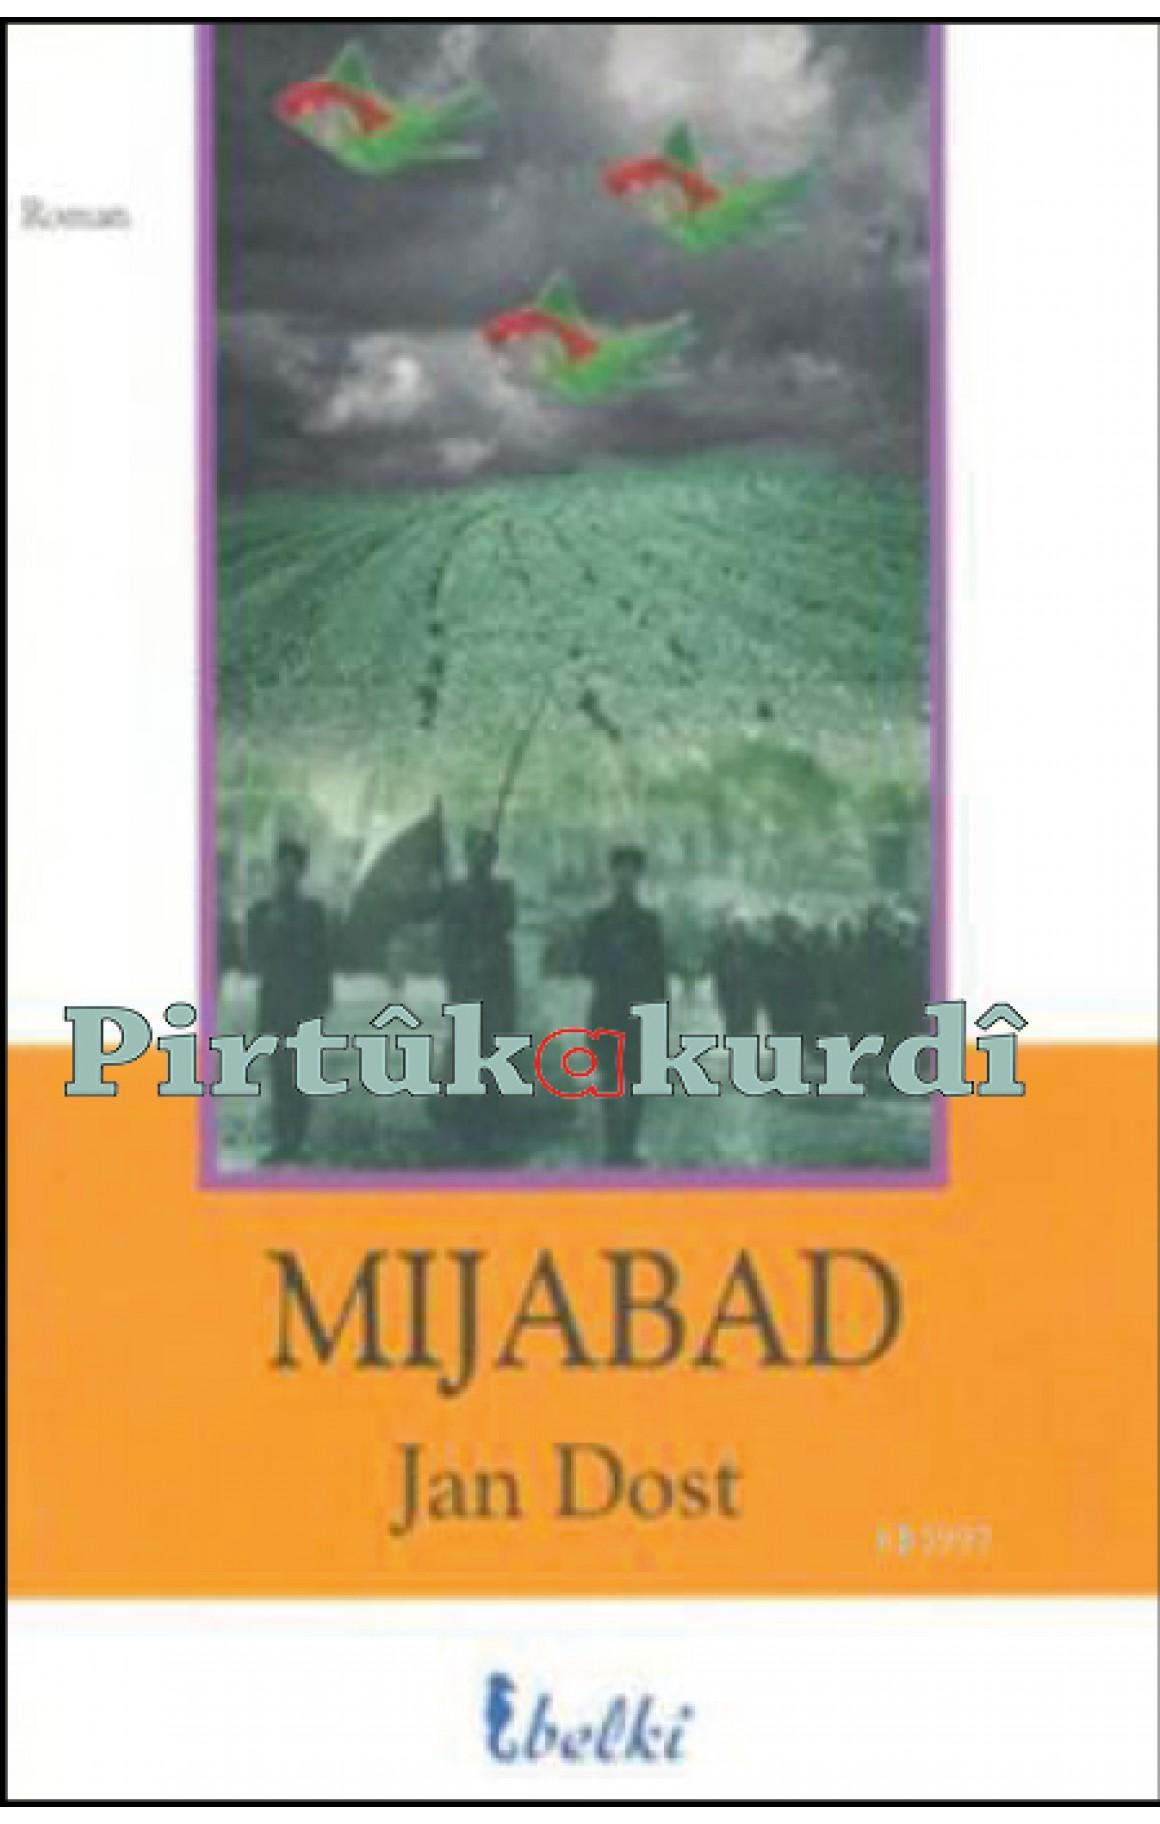 Mijabad